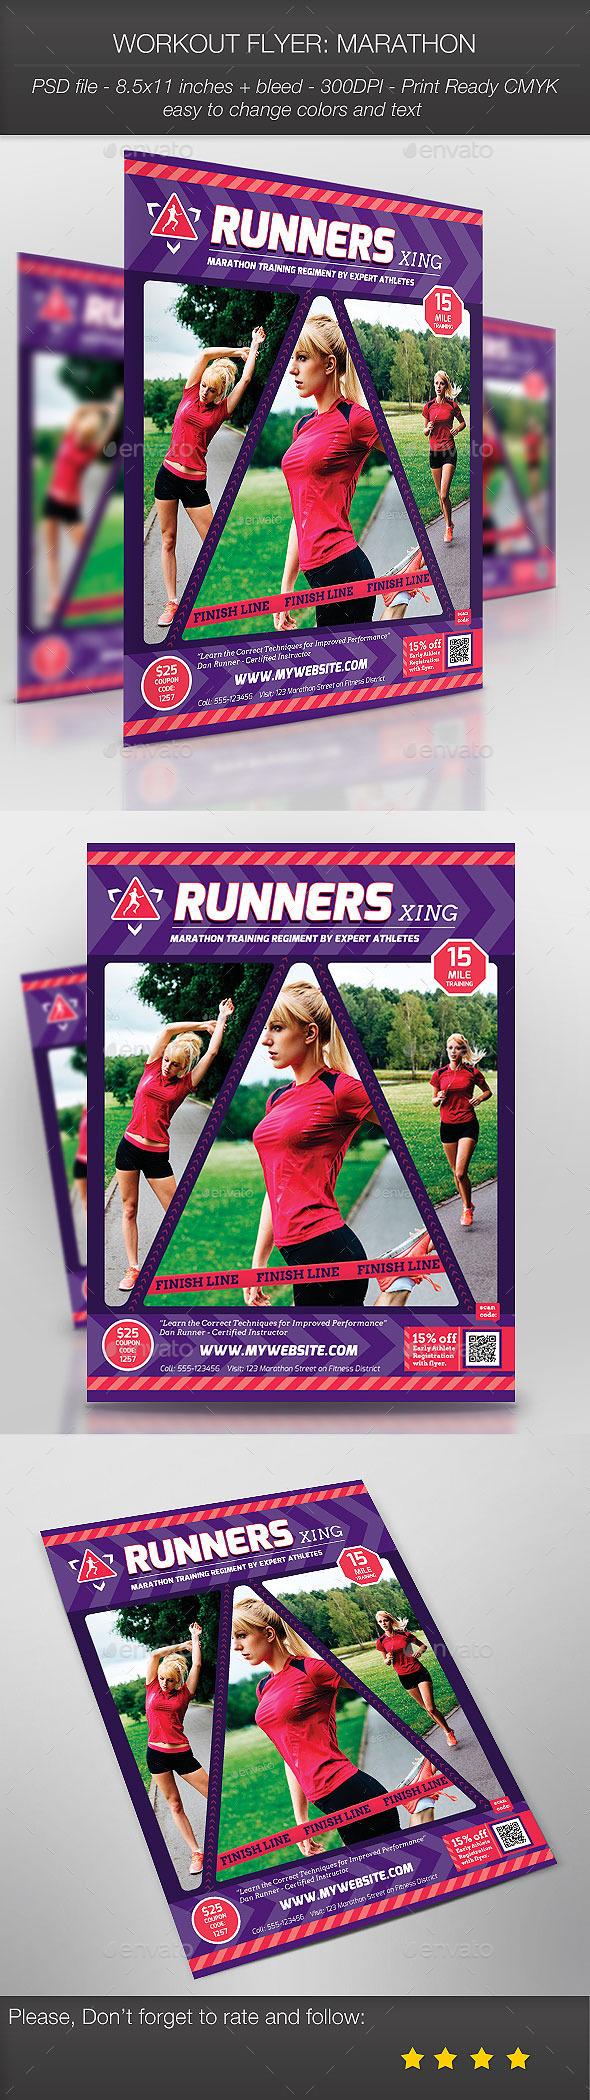 Workout Flyer: Marathon - Sports Events